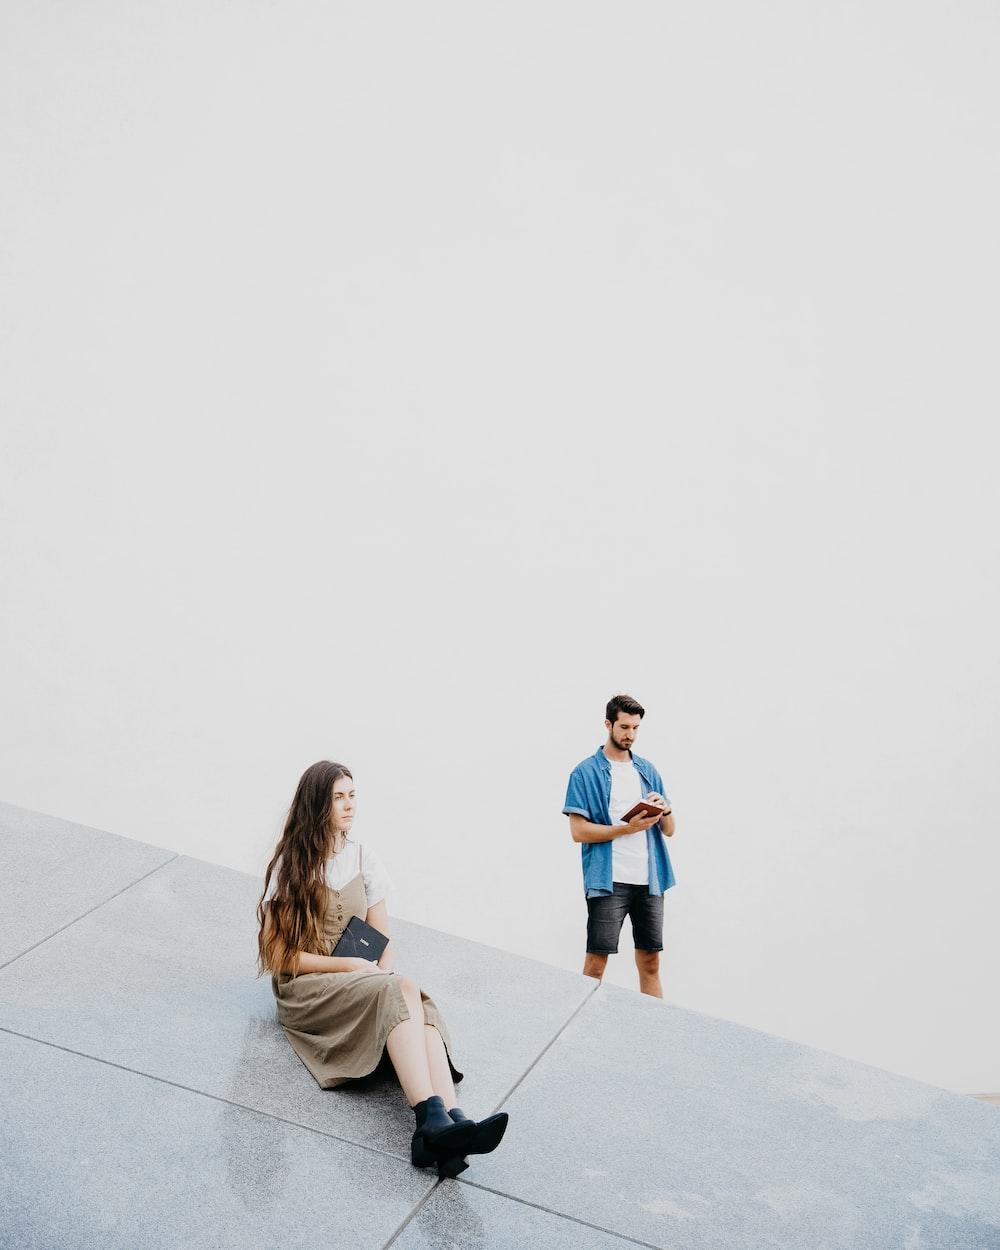 woman sitting on floor near man standing